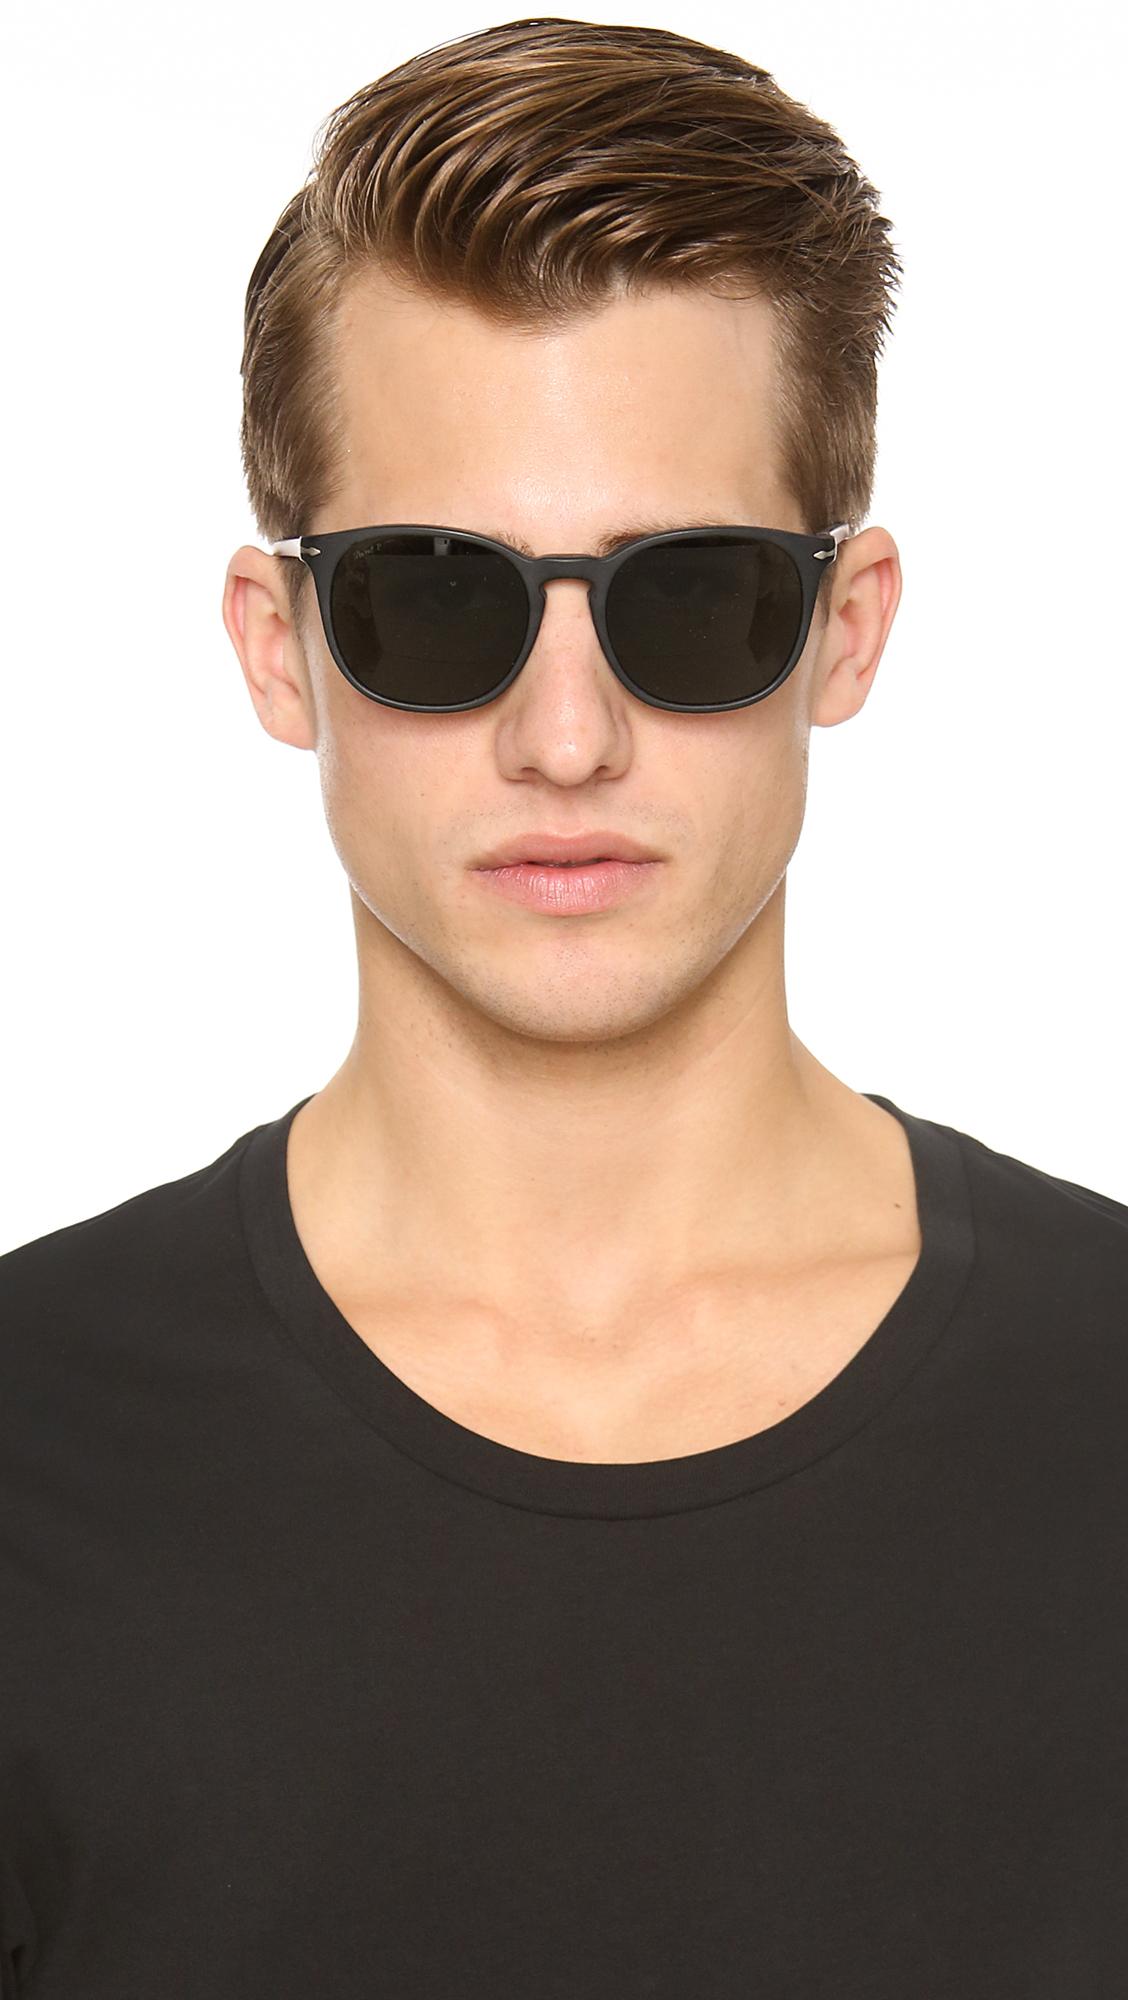 70caf670ca Lyst - Persol Polarized Classic Sunglasses in Black for Men